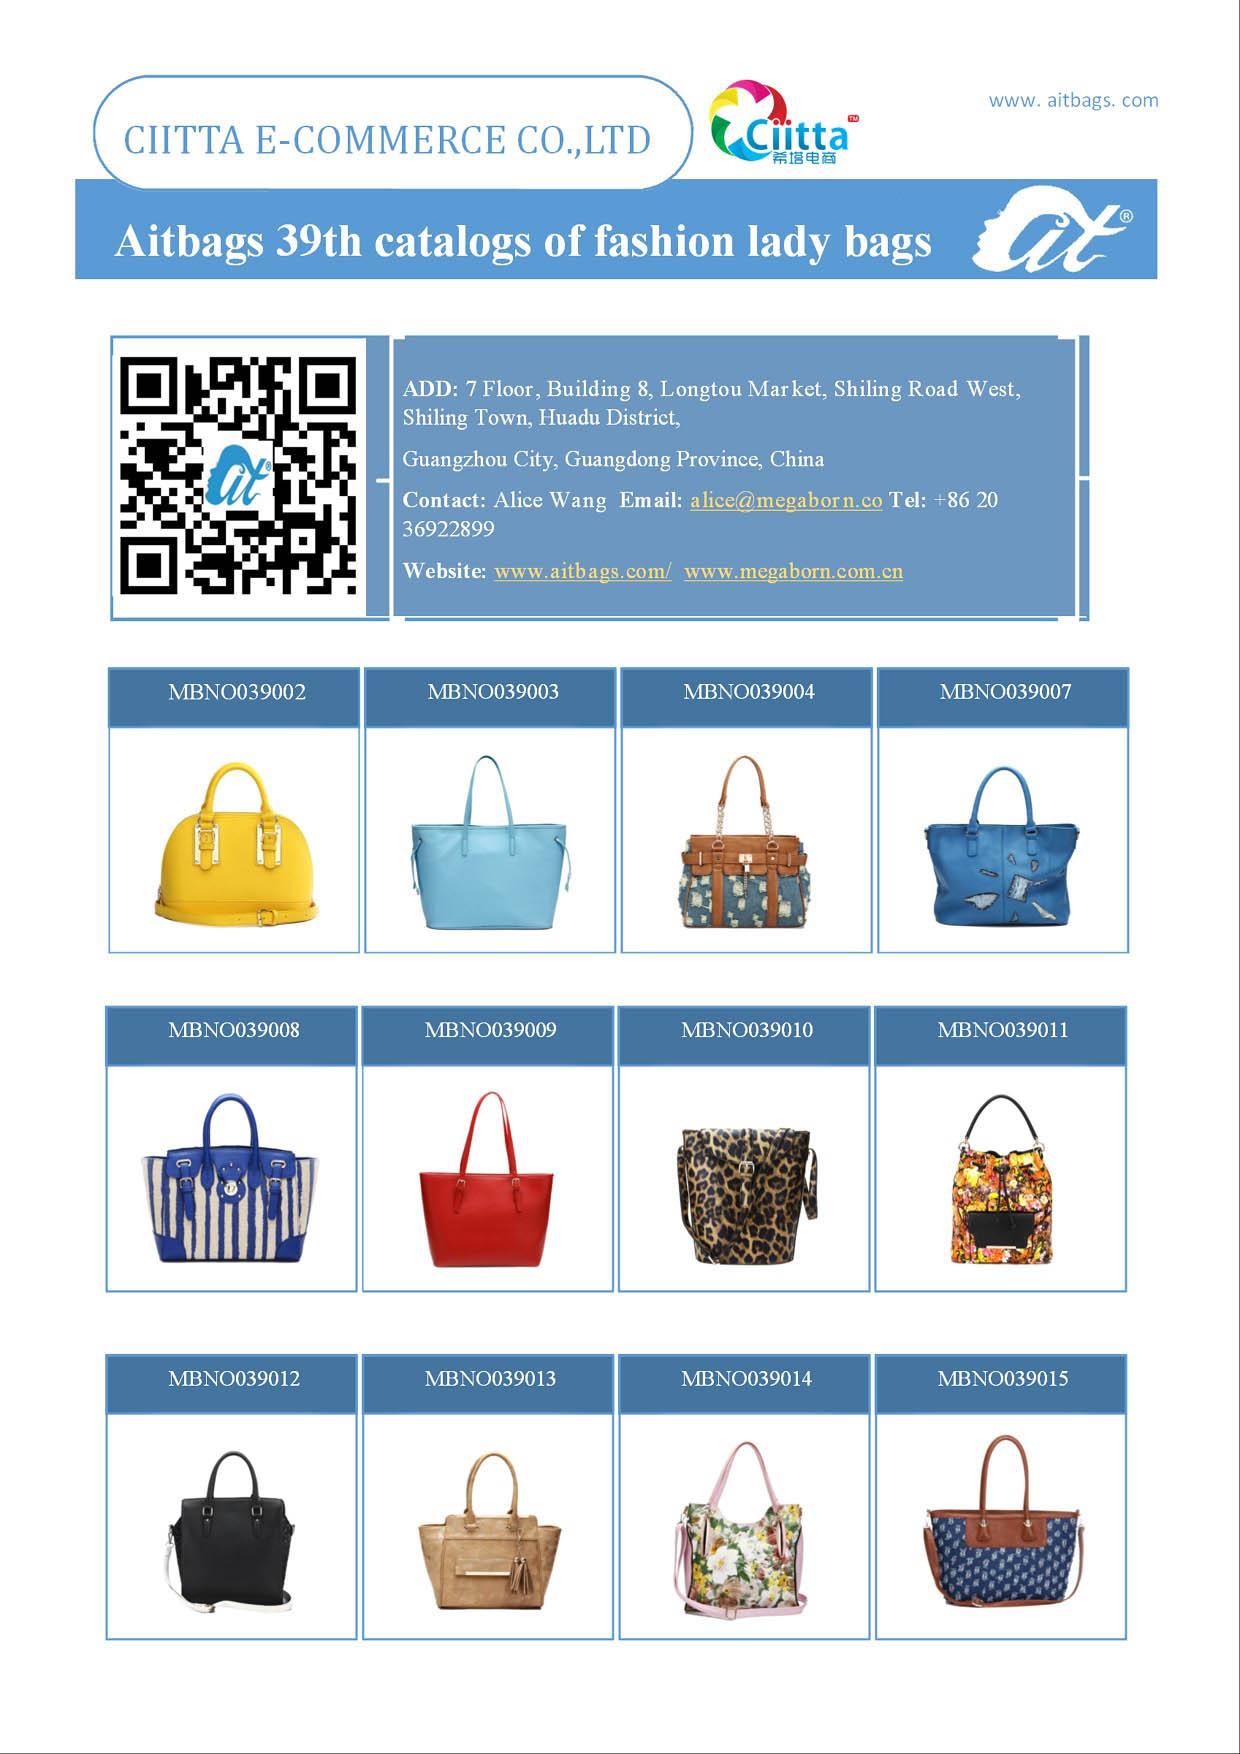 Aitbags 39th Catalogs of Fashion Lady Bag-1